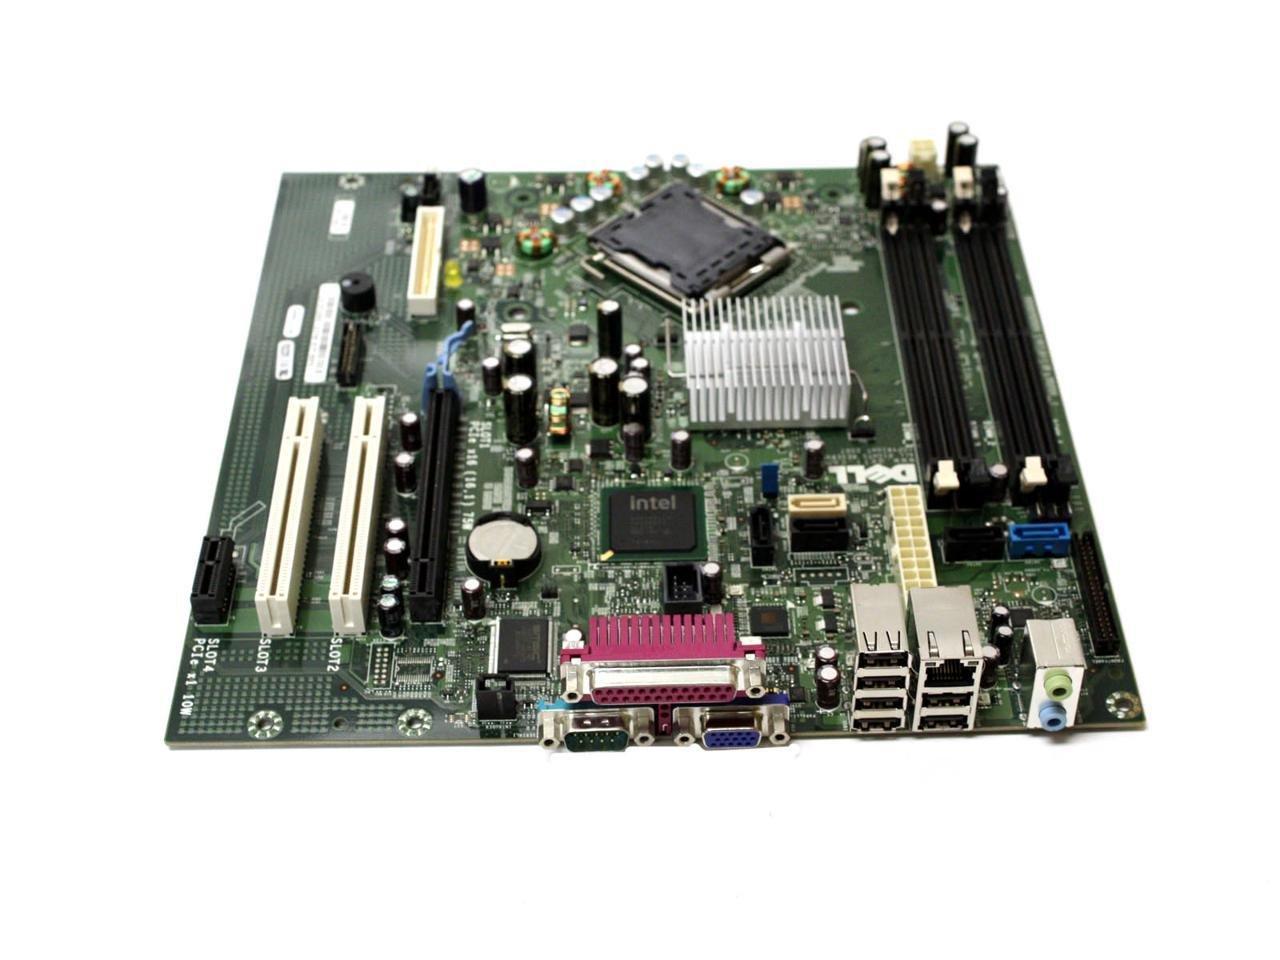 New Genuine OEM DELL Optiplex 755 Motherboard SMT Desktop Mini Small Tower Y255C Intel GM819 JR271 Logic Main System Board Assembly Intel Celeron Core 2 Duo